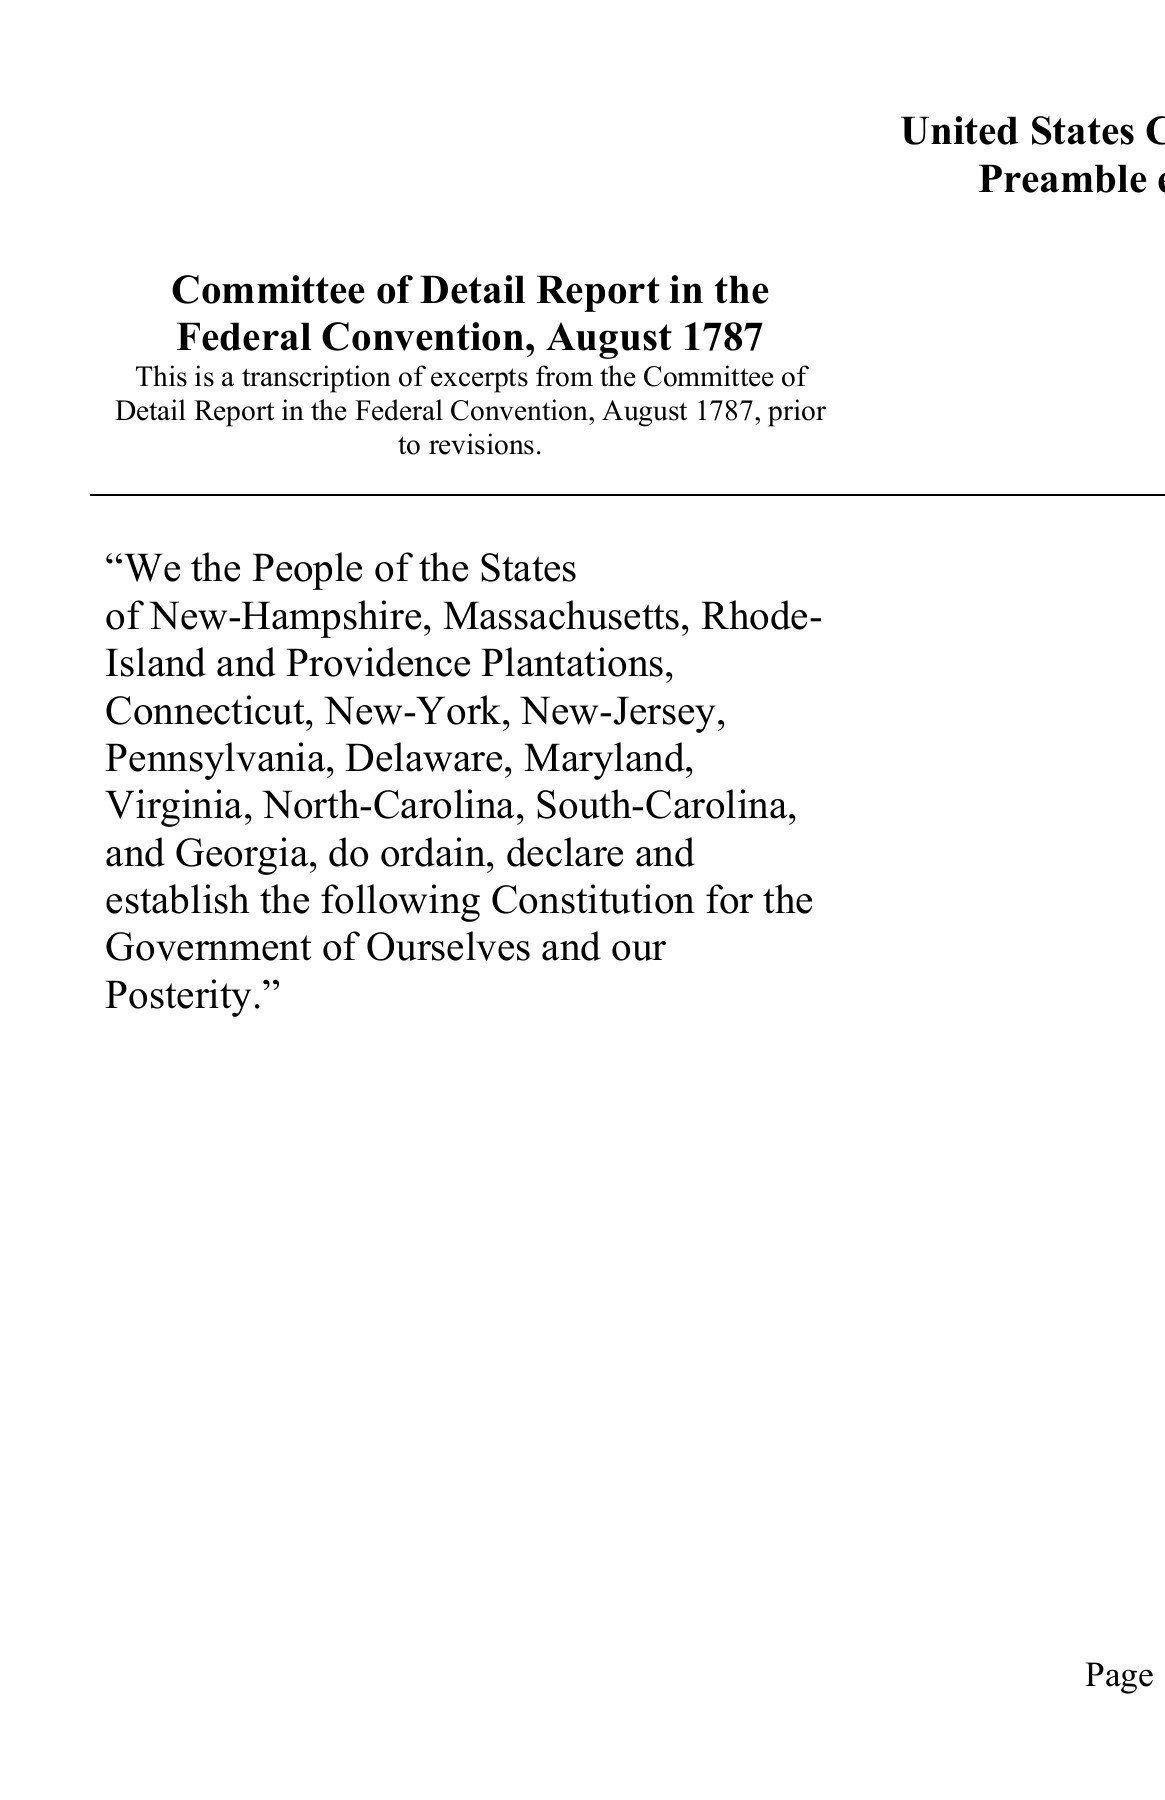 United States Constitution Worksheet United States